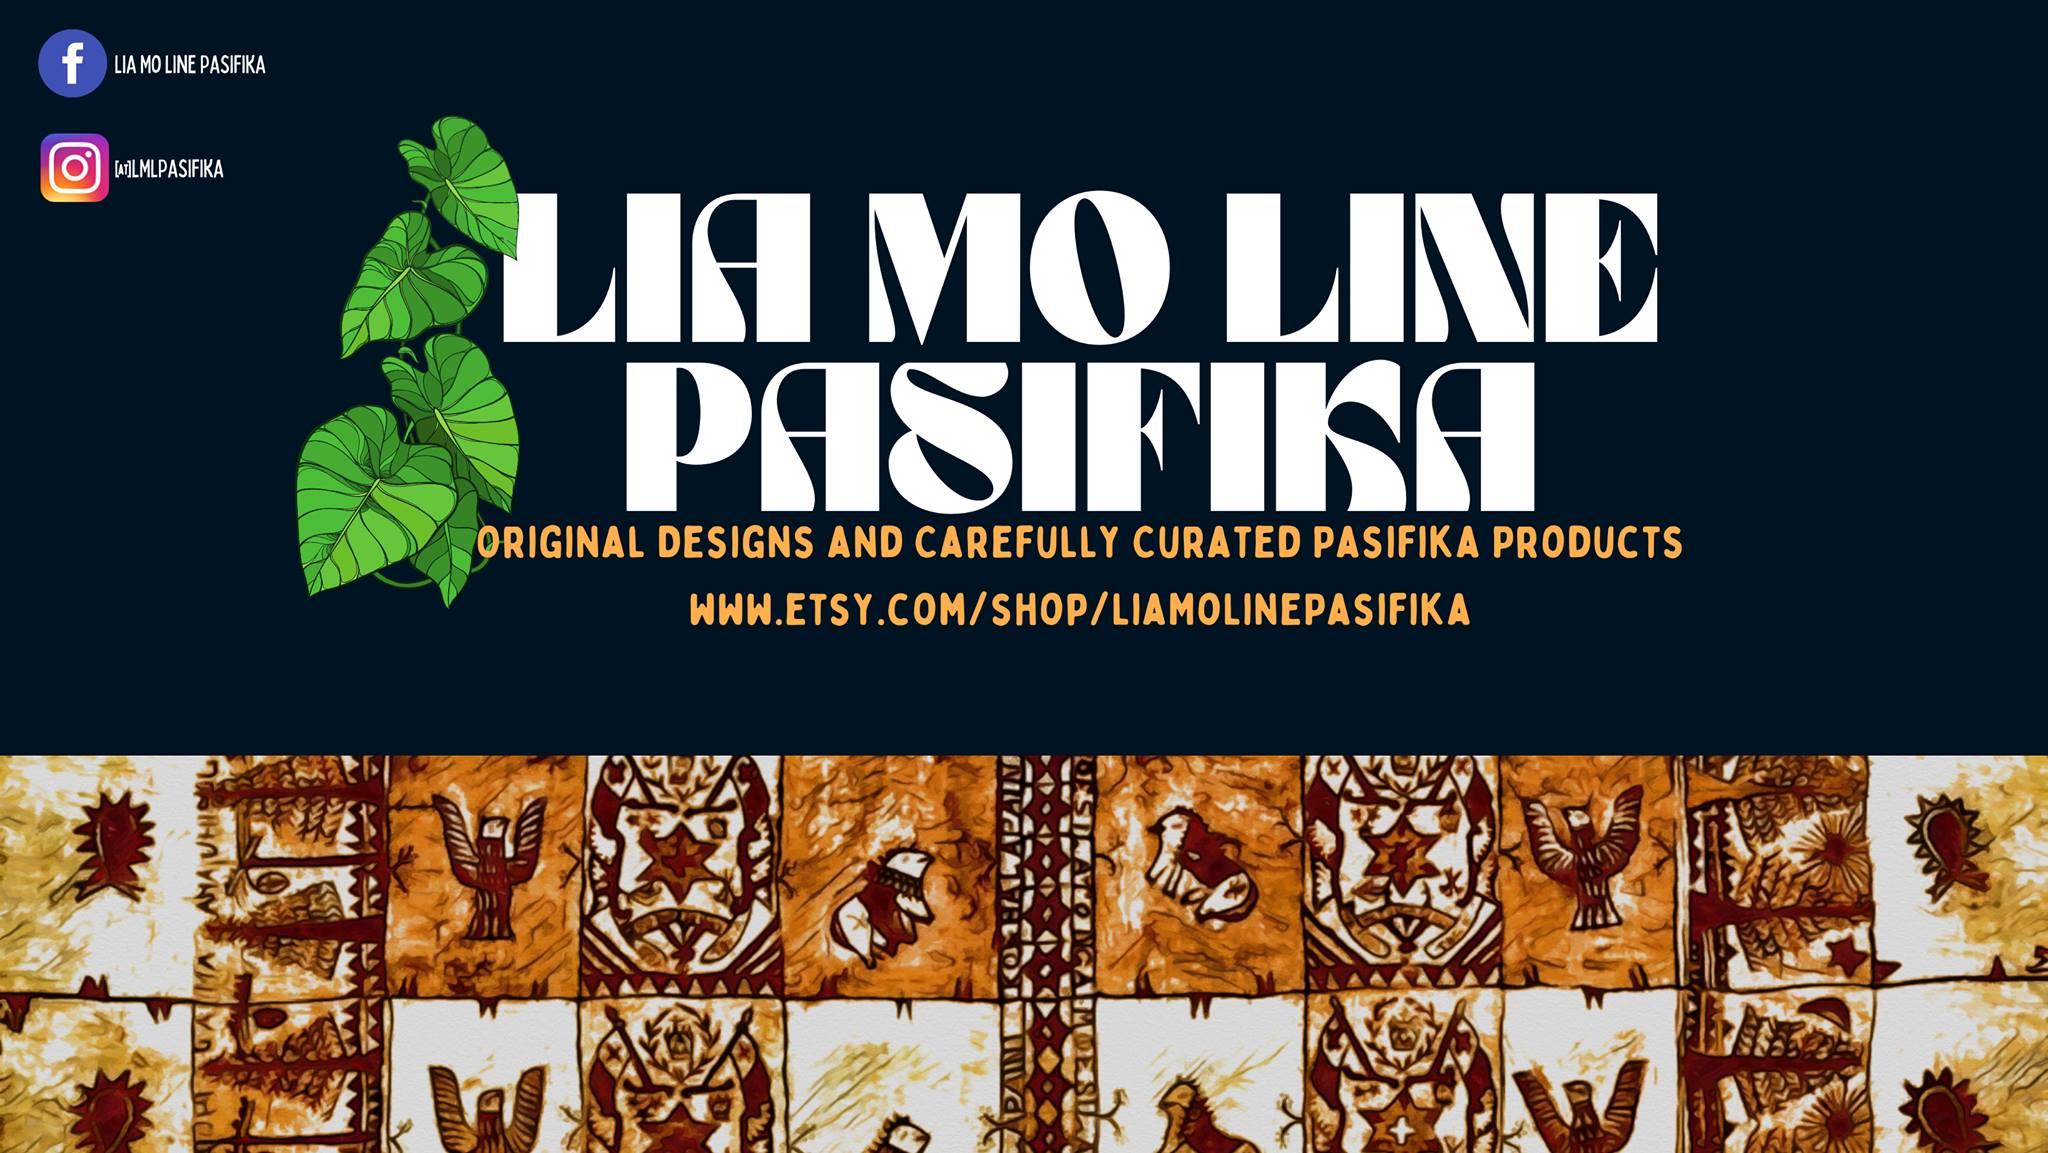 Lia Mo Line Pasifika – Pasifika-themed and created merchandise